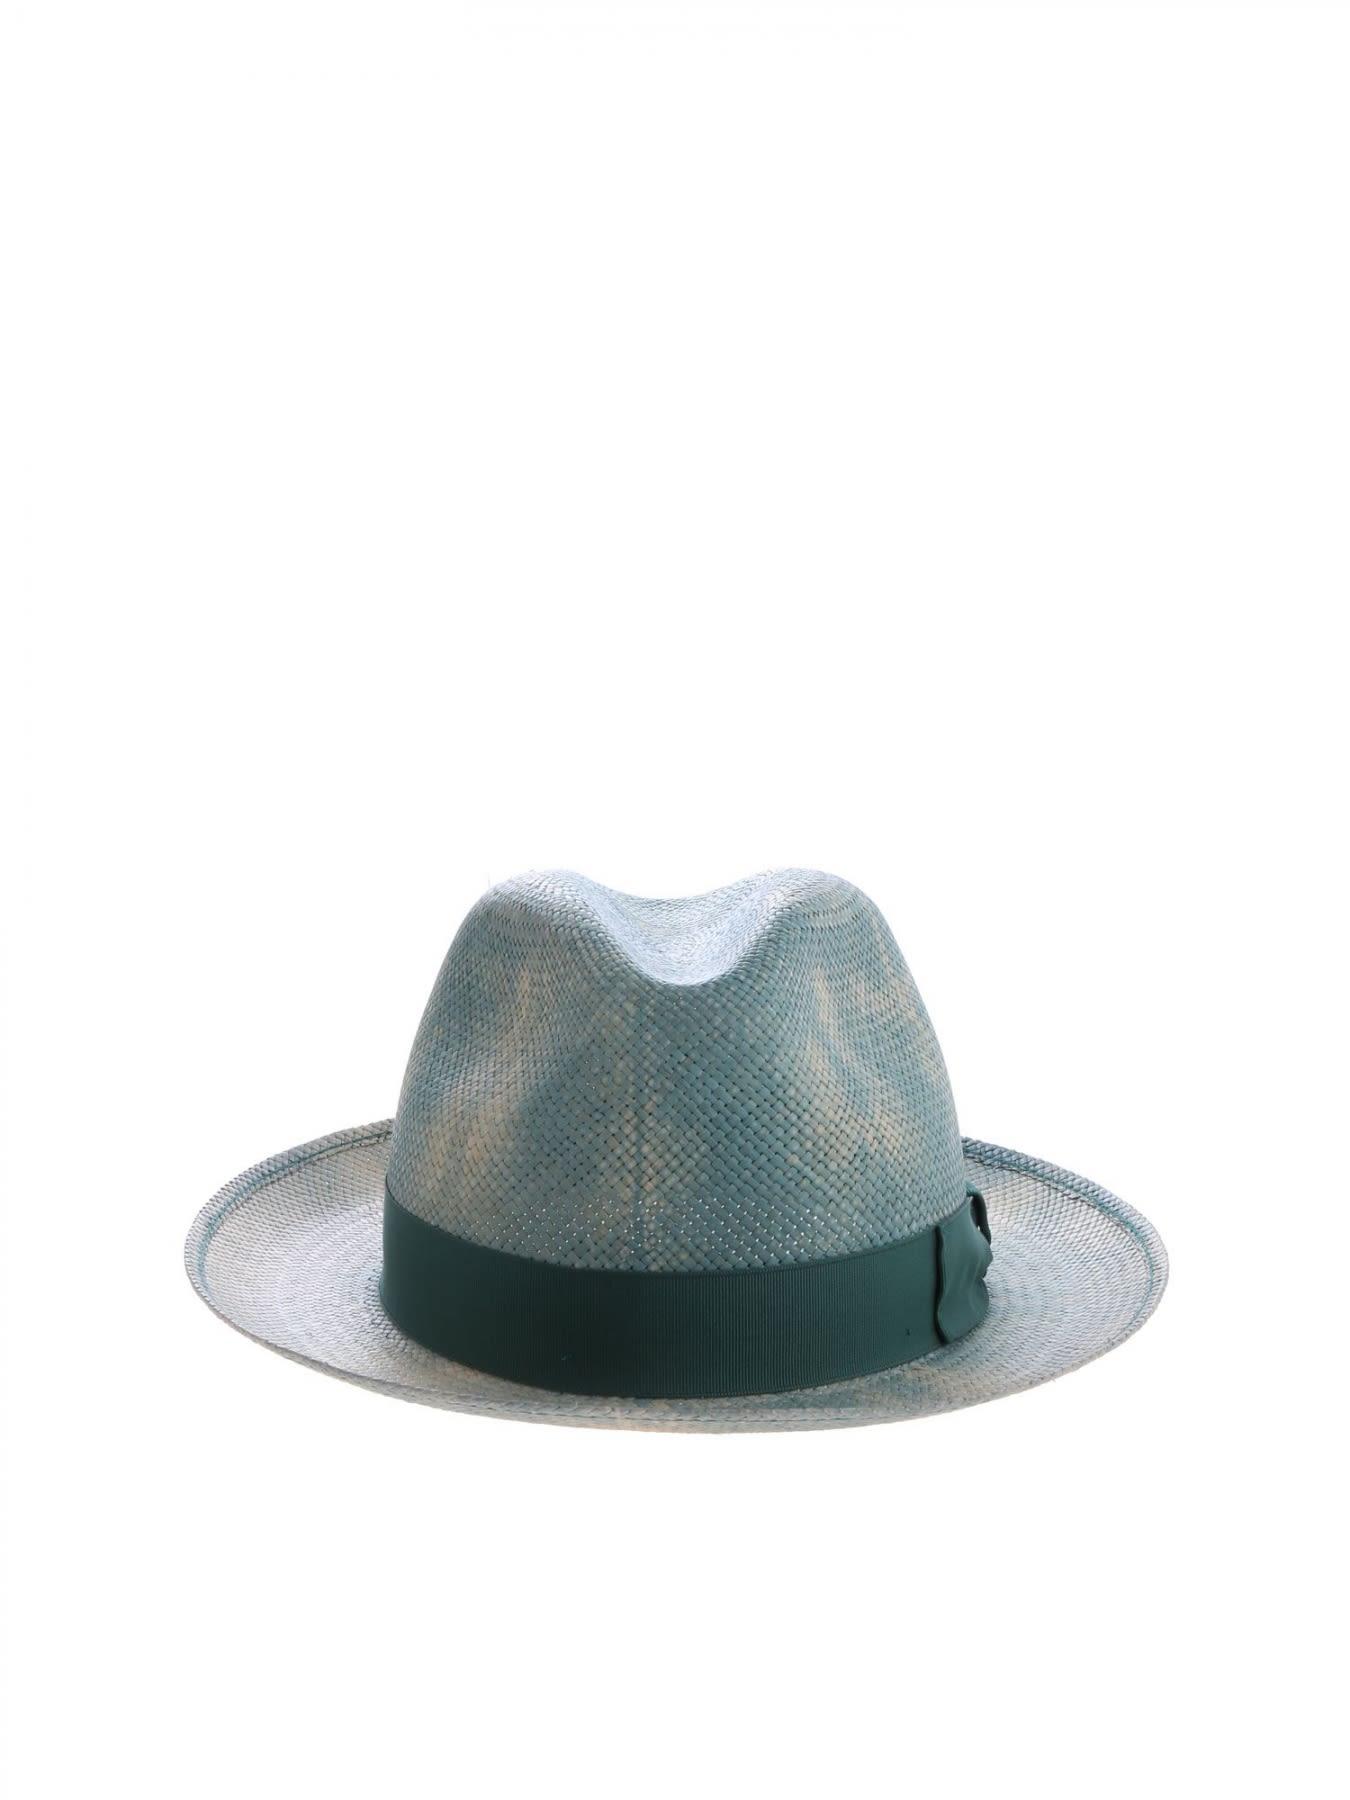 8bea8b3a307920 Borsalino Borsalino Straw Hat - Beige - 10878868 | italist